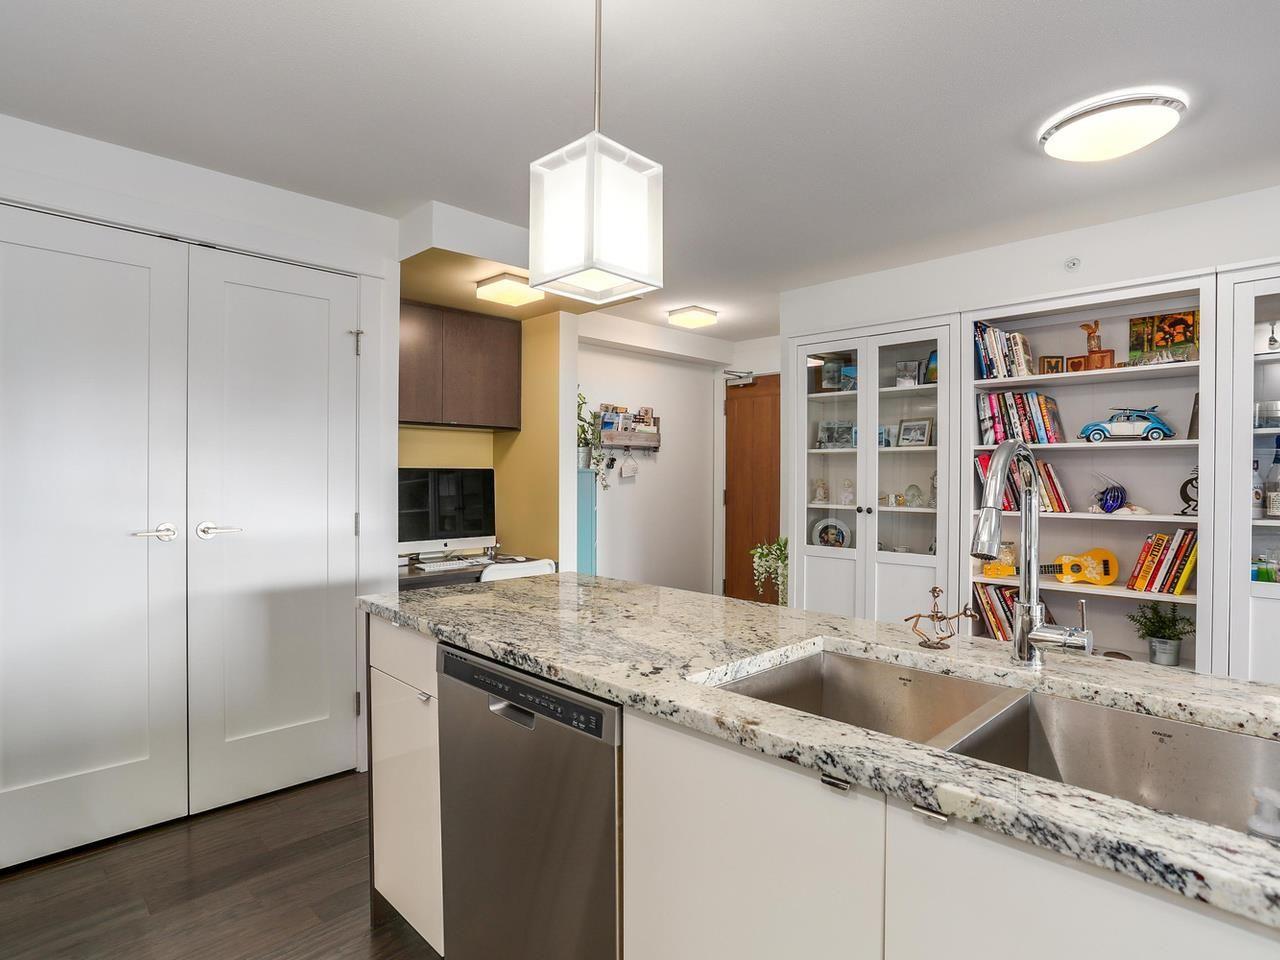 "Photo 10: Photos: 202 14955 VICTORIA Avenue: White Rock Condo for sale in ""SAUSALITO BEACH SIDE LIVING"" (South Surrey White Rock)  : MLS®# R2128764"